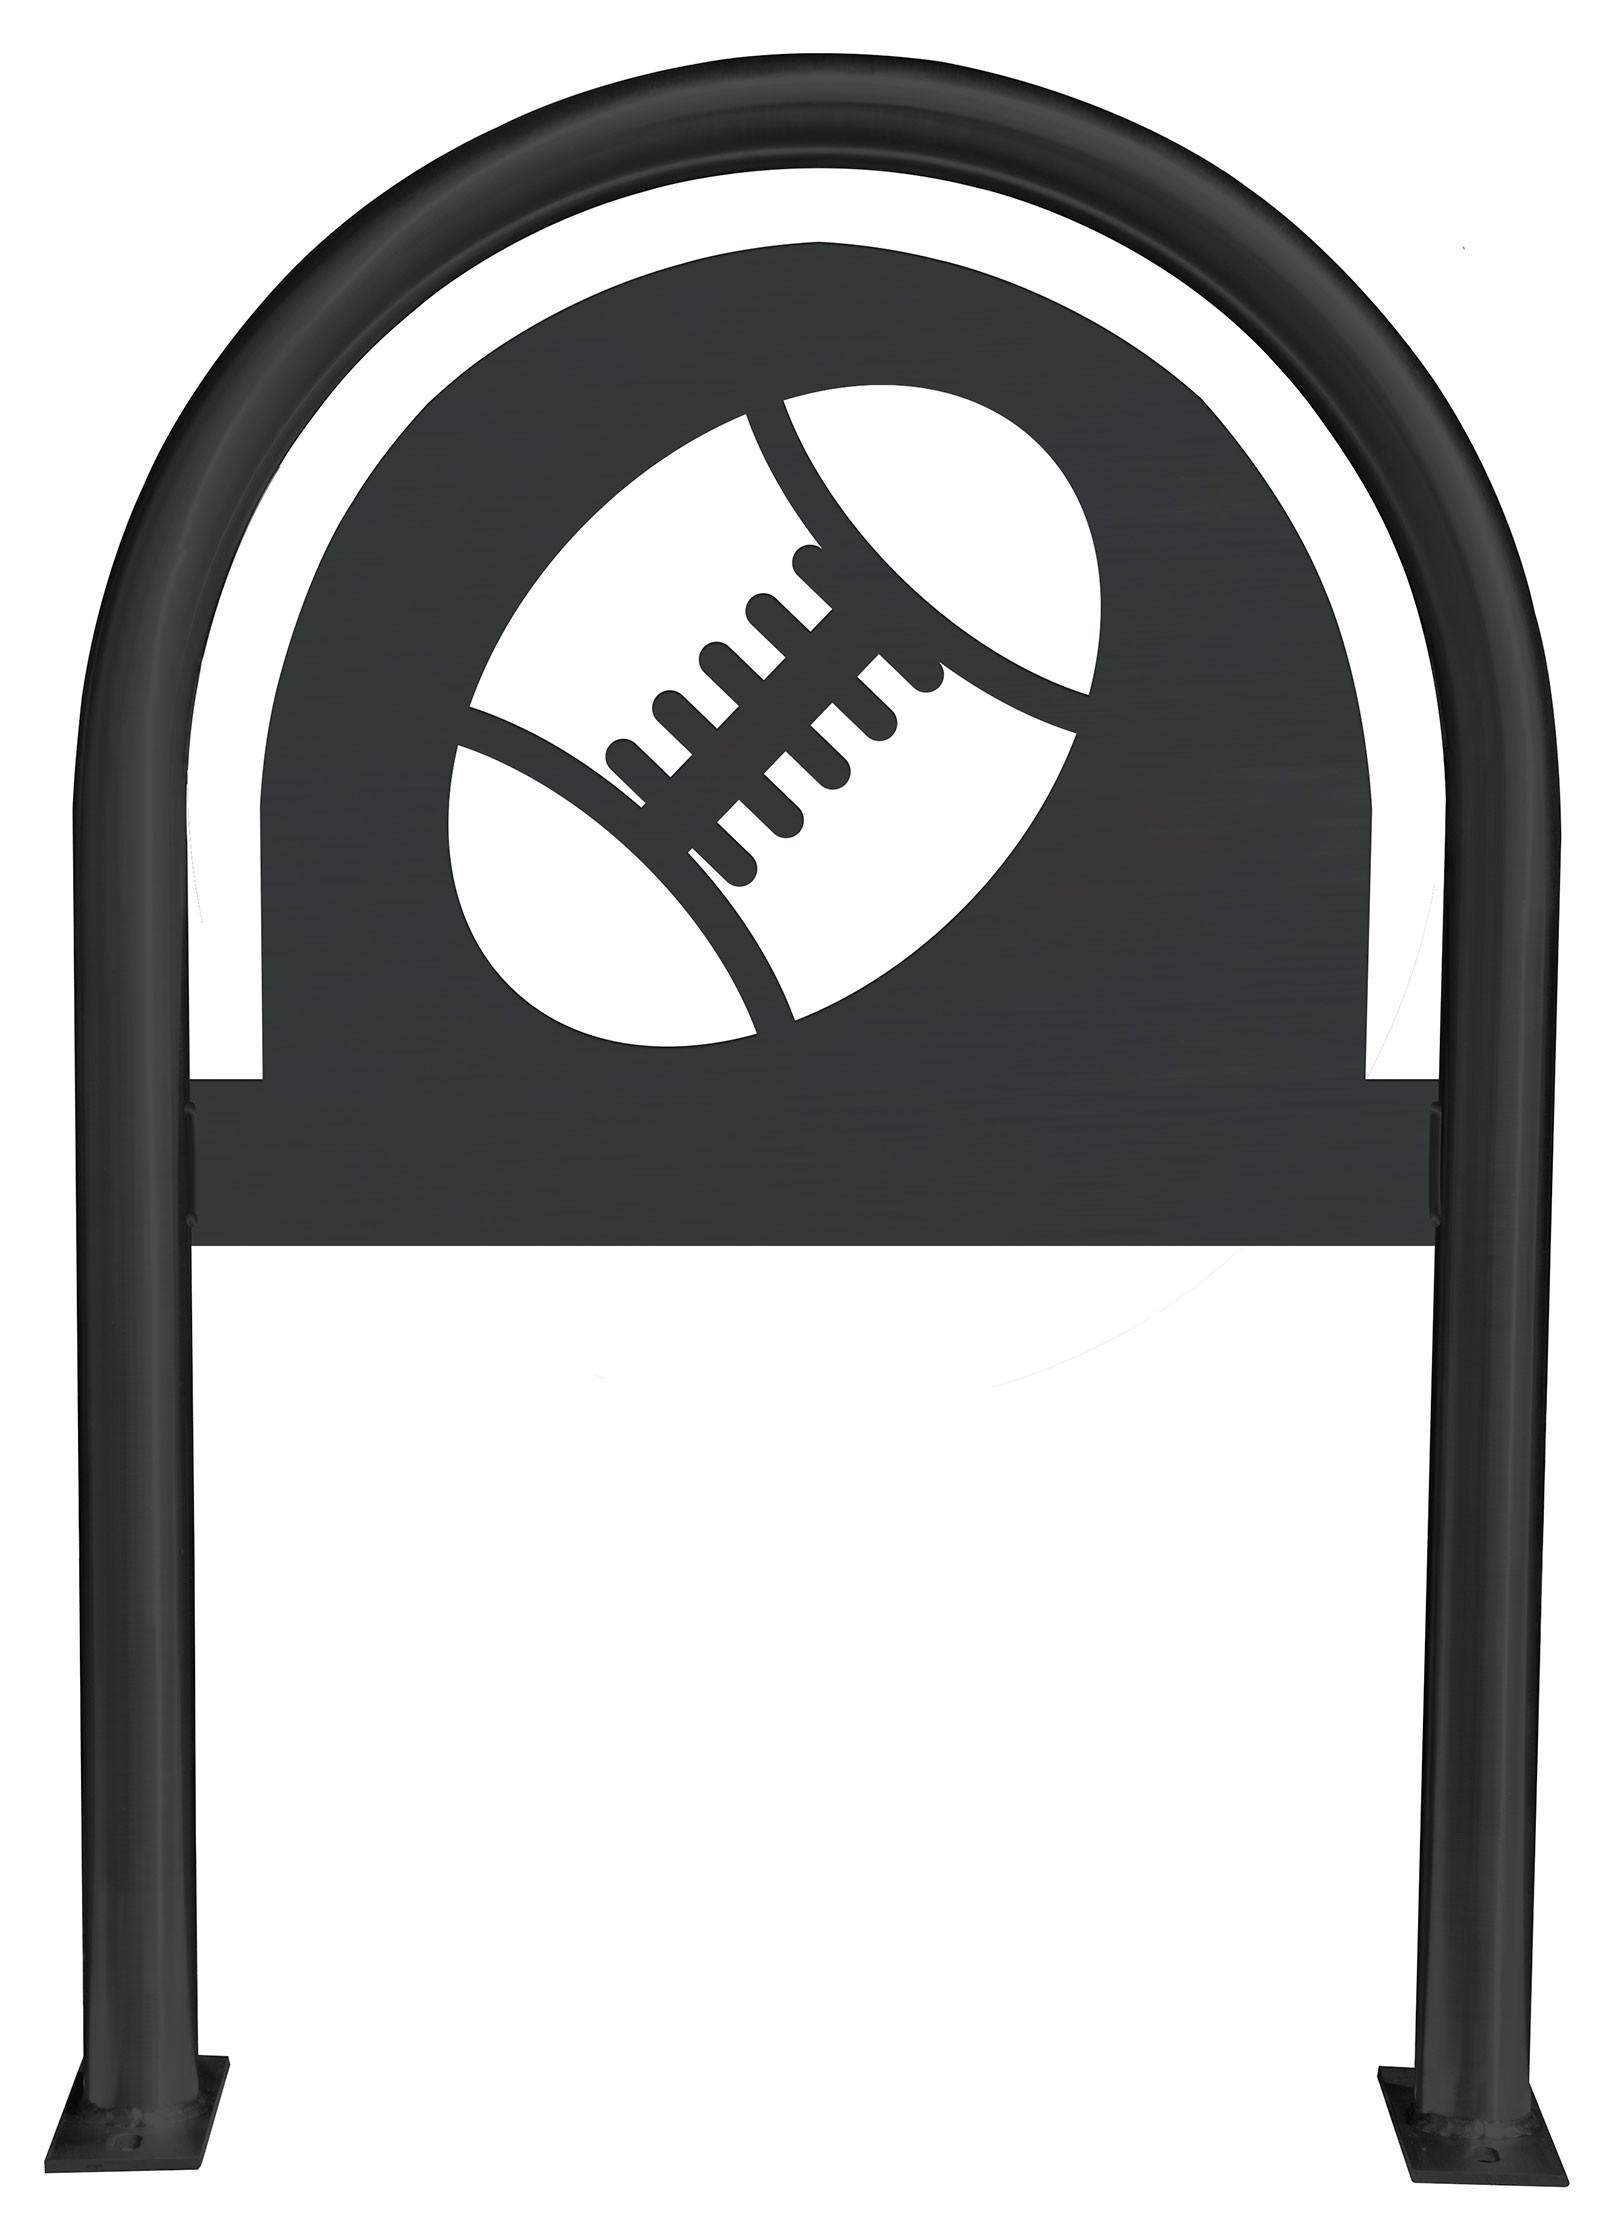 Football Laser Cut Panel Themed Bike Rack